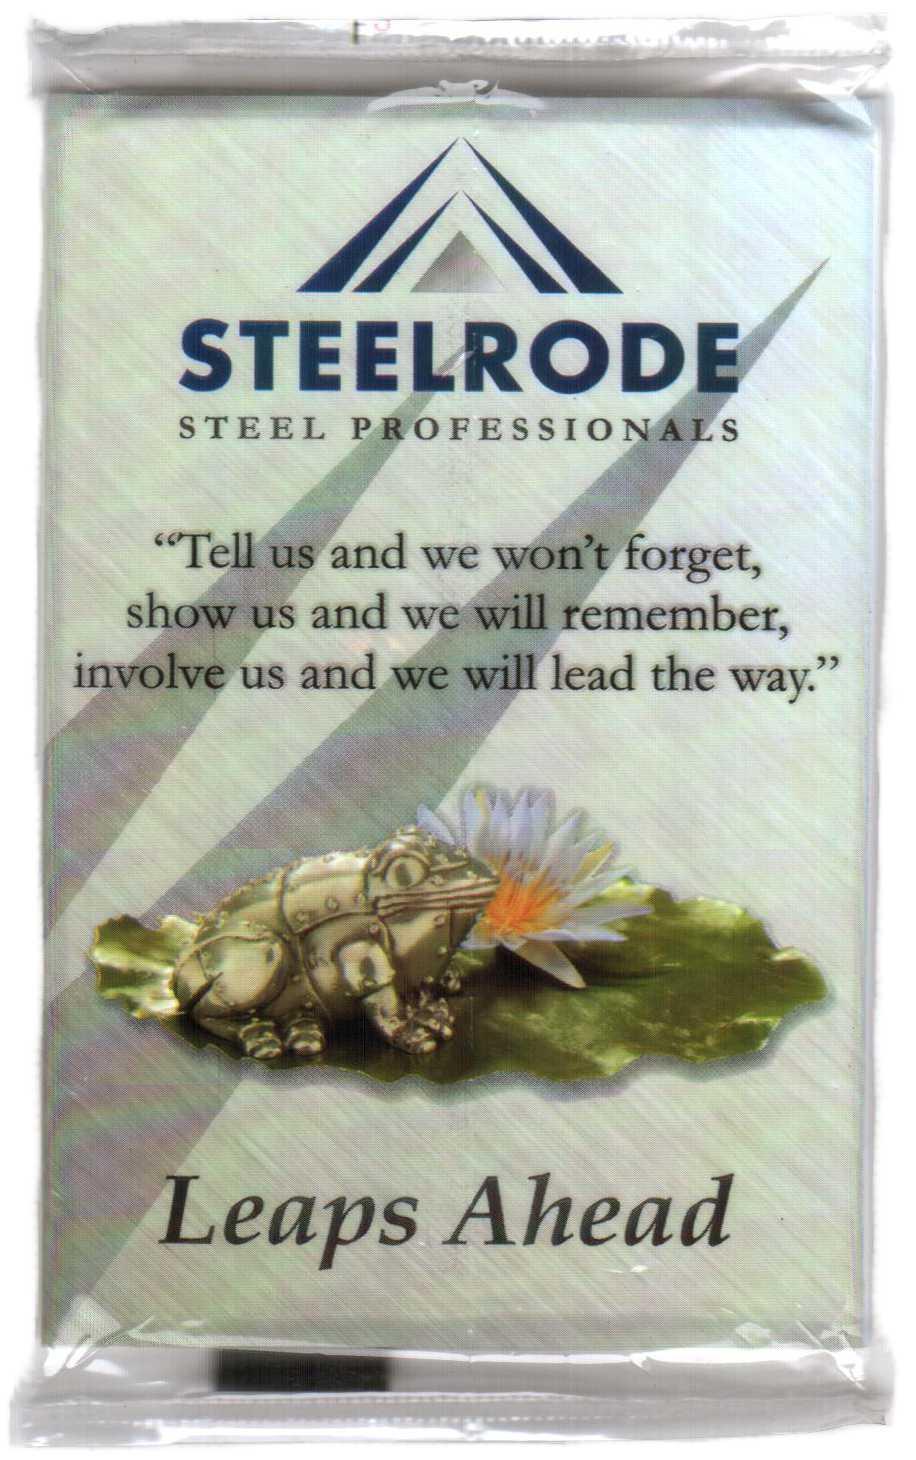 Steelrode